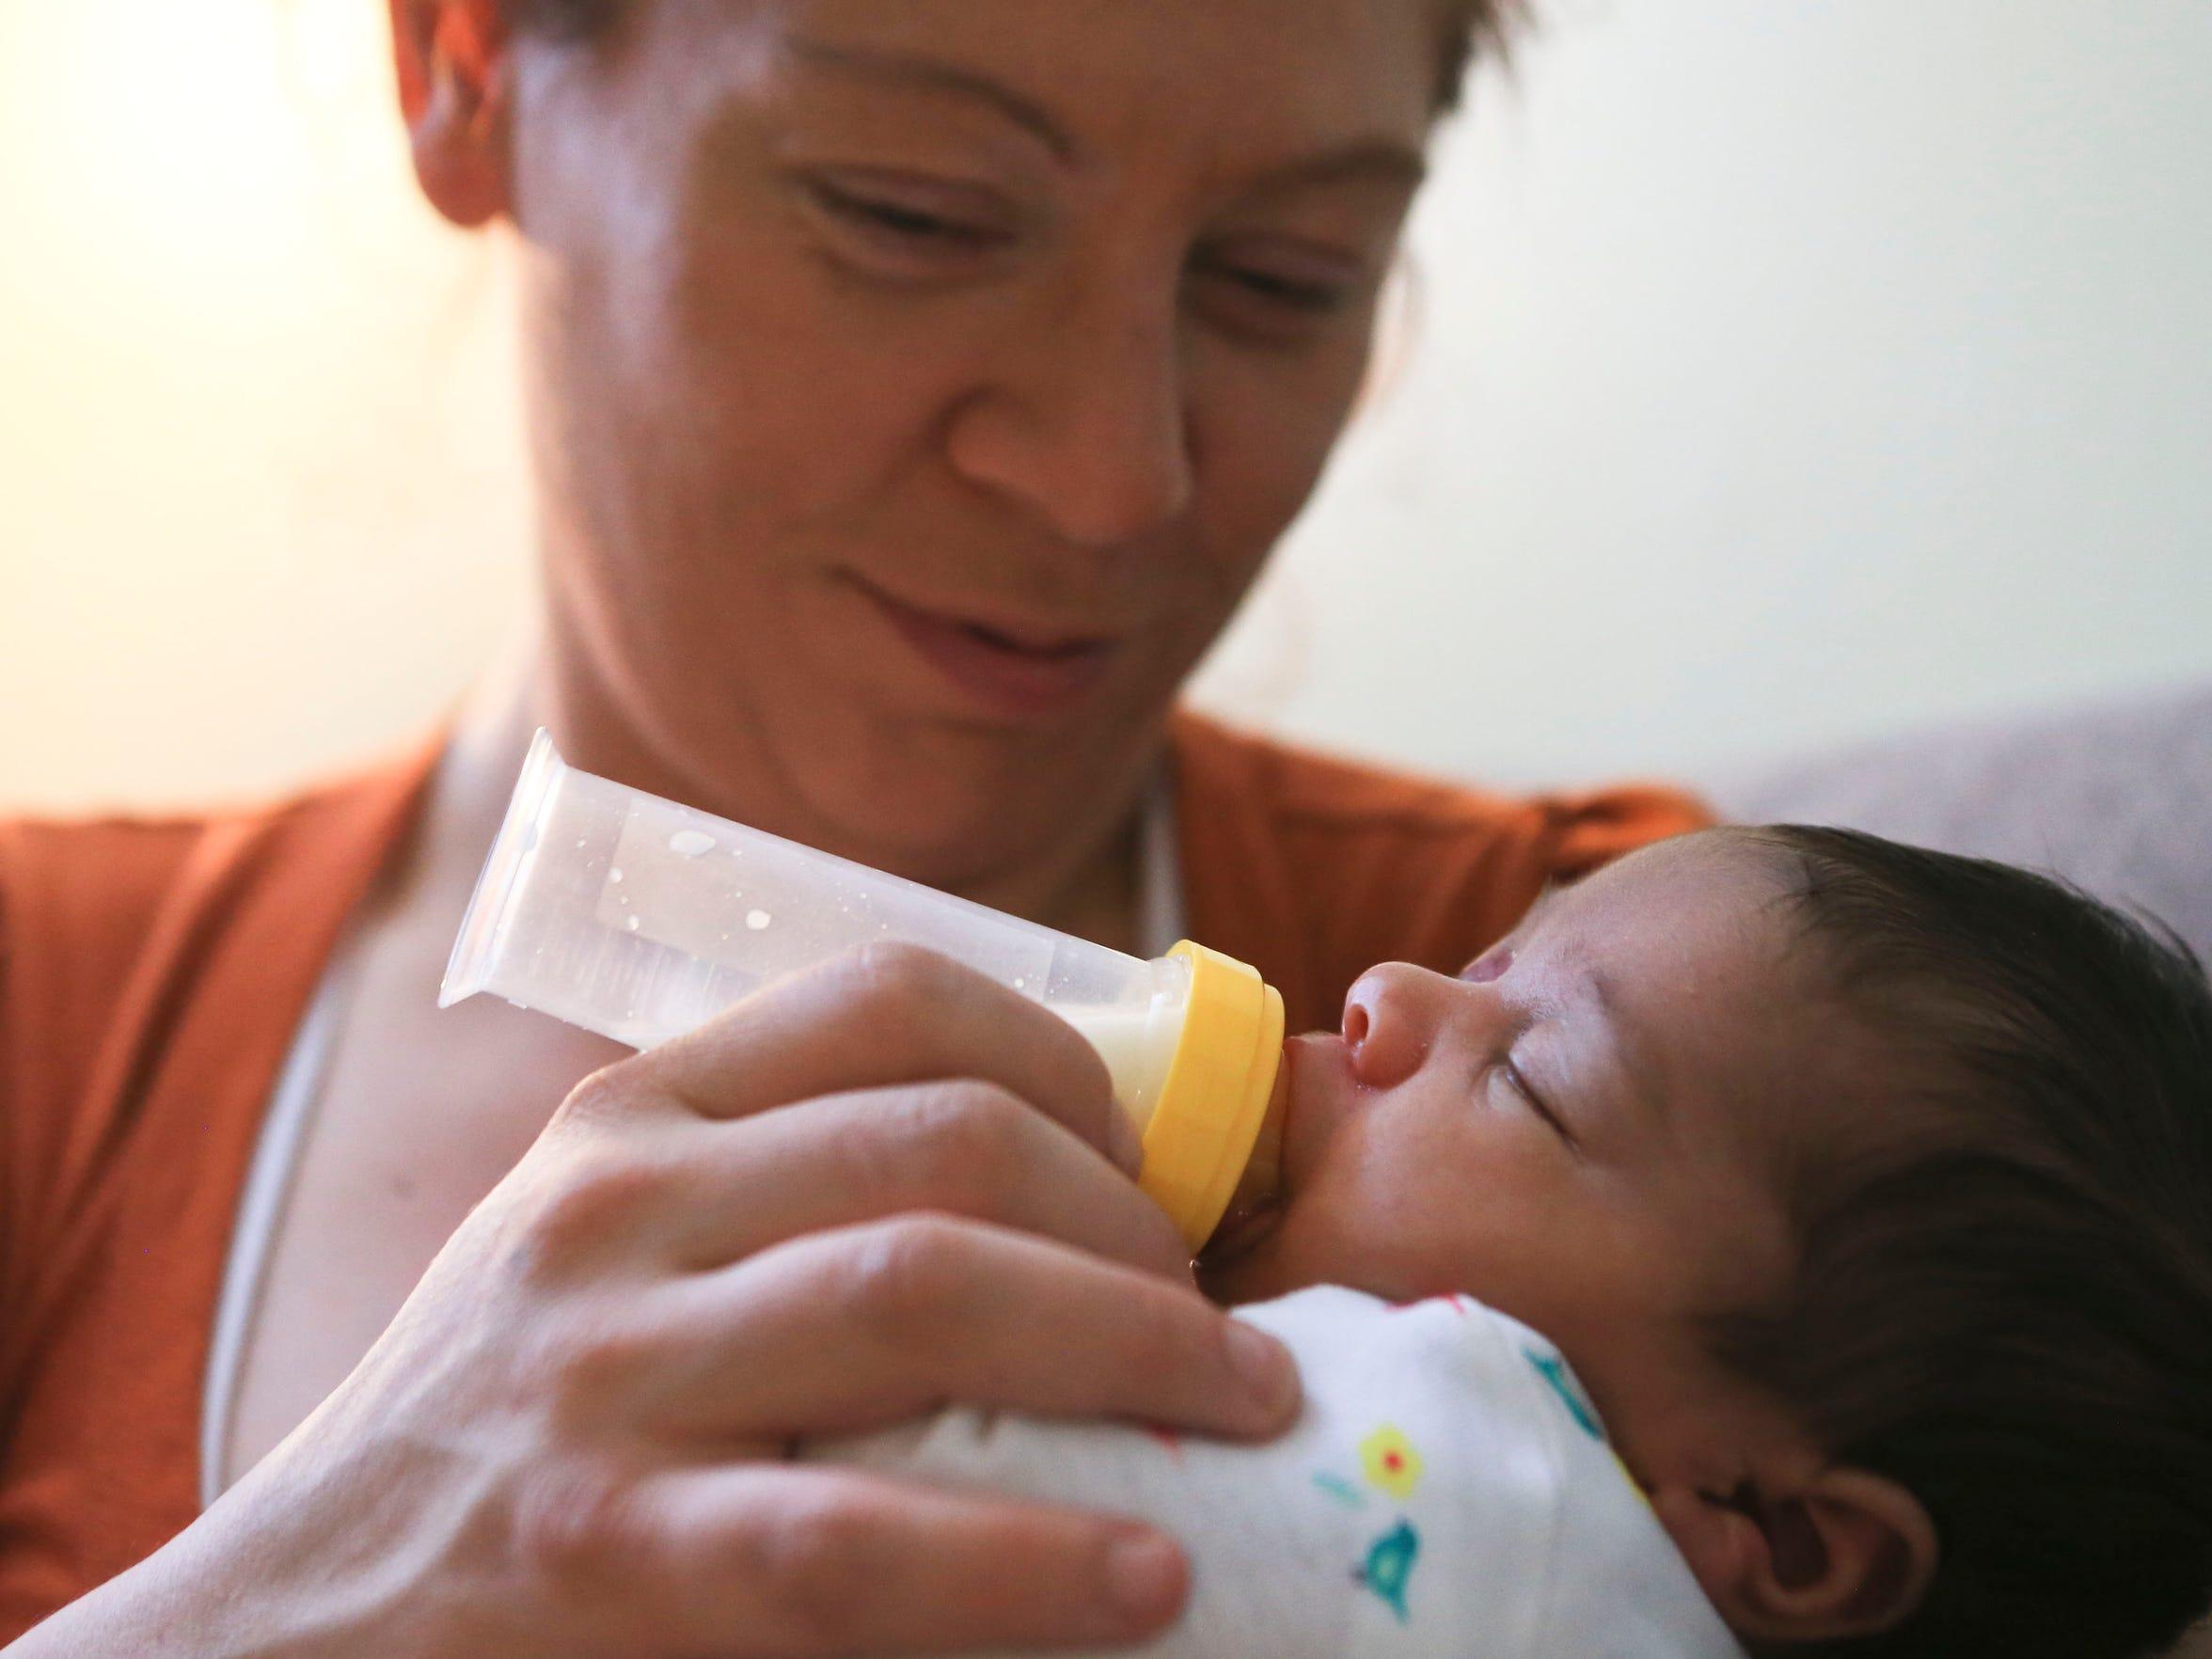 Kymbal Pruett, 36, tends to newborn Elisabeth while